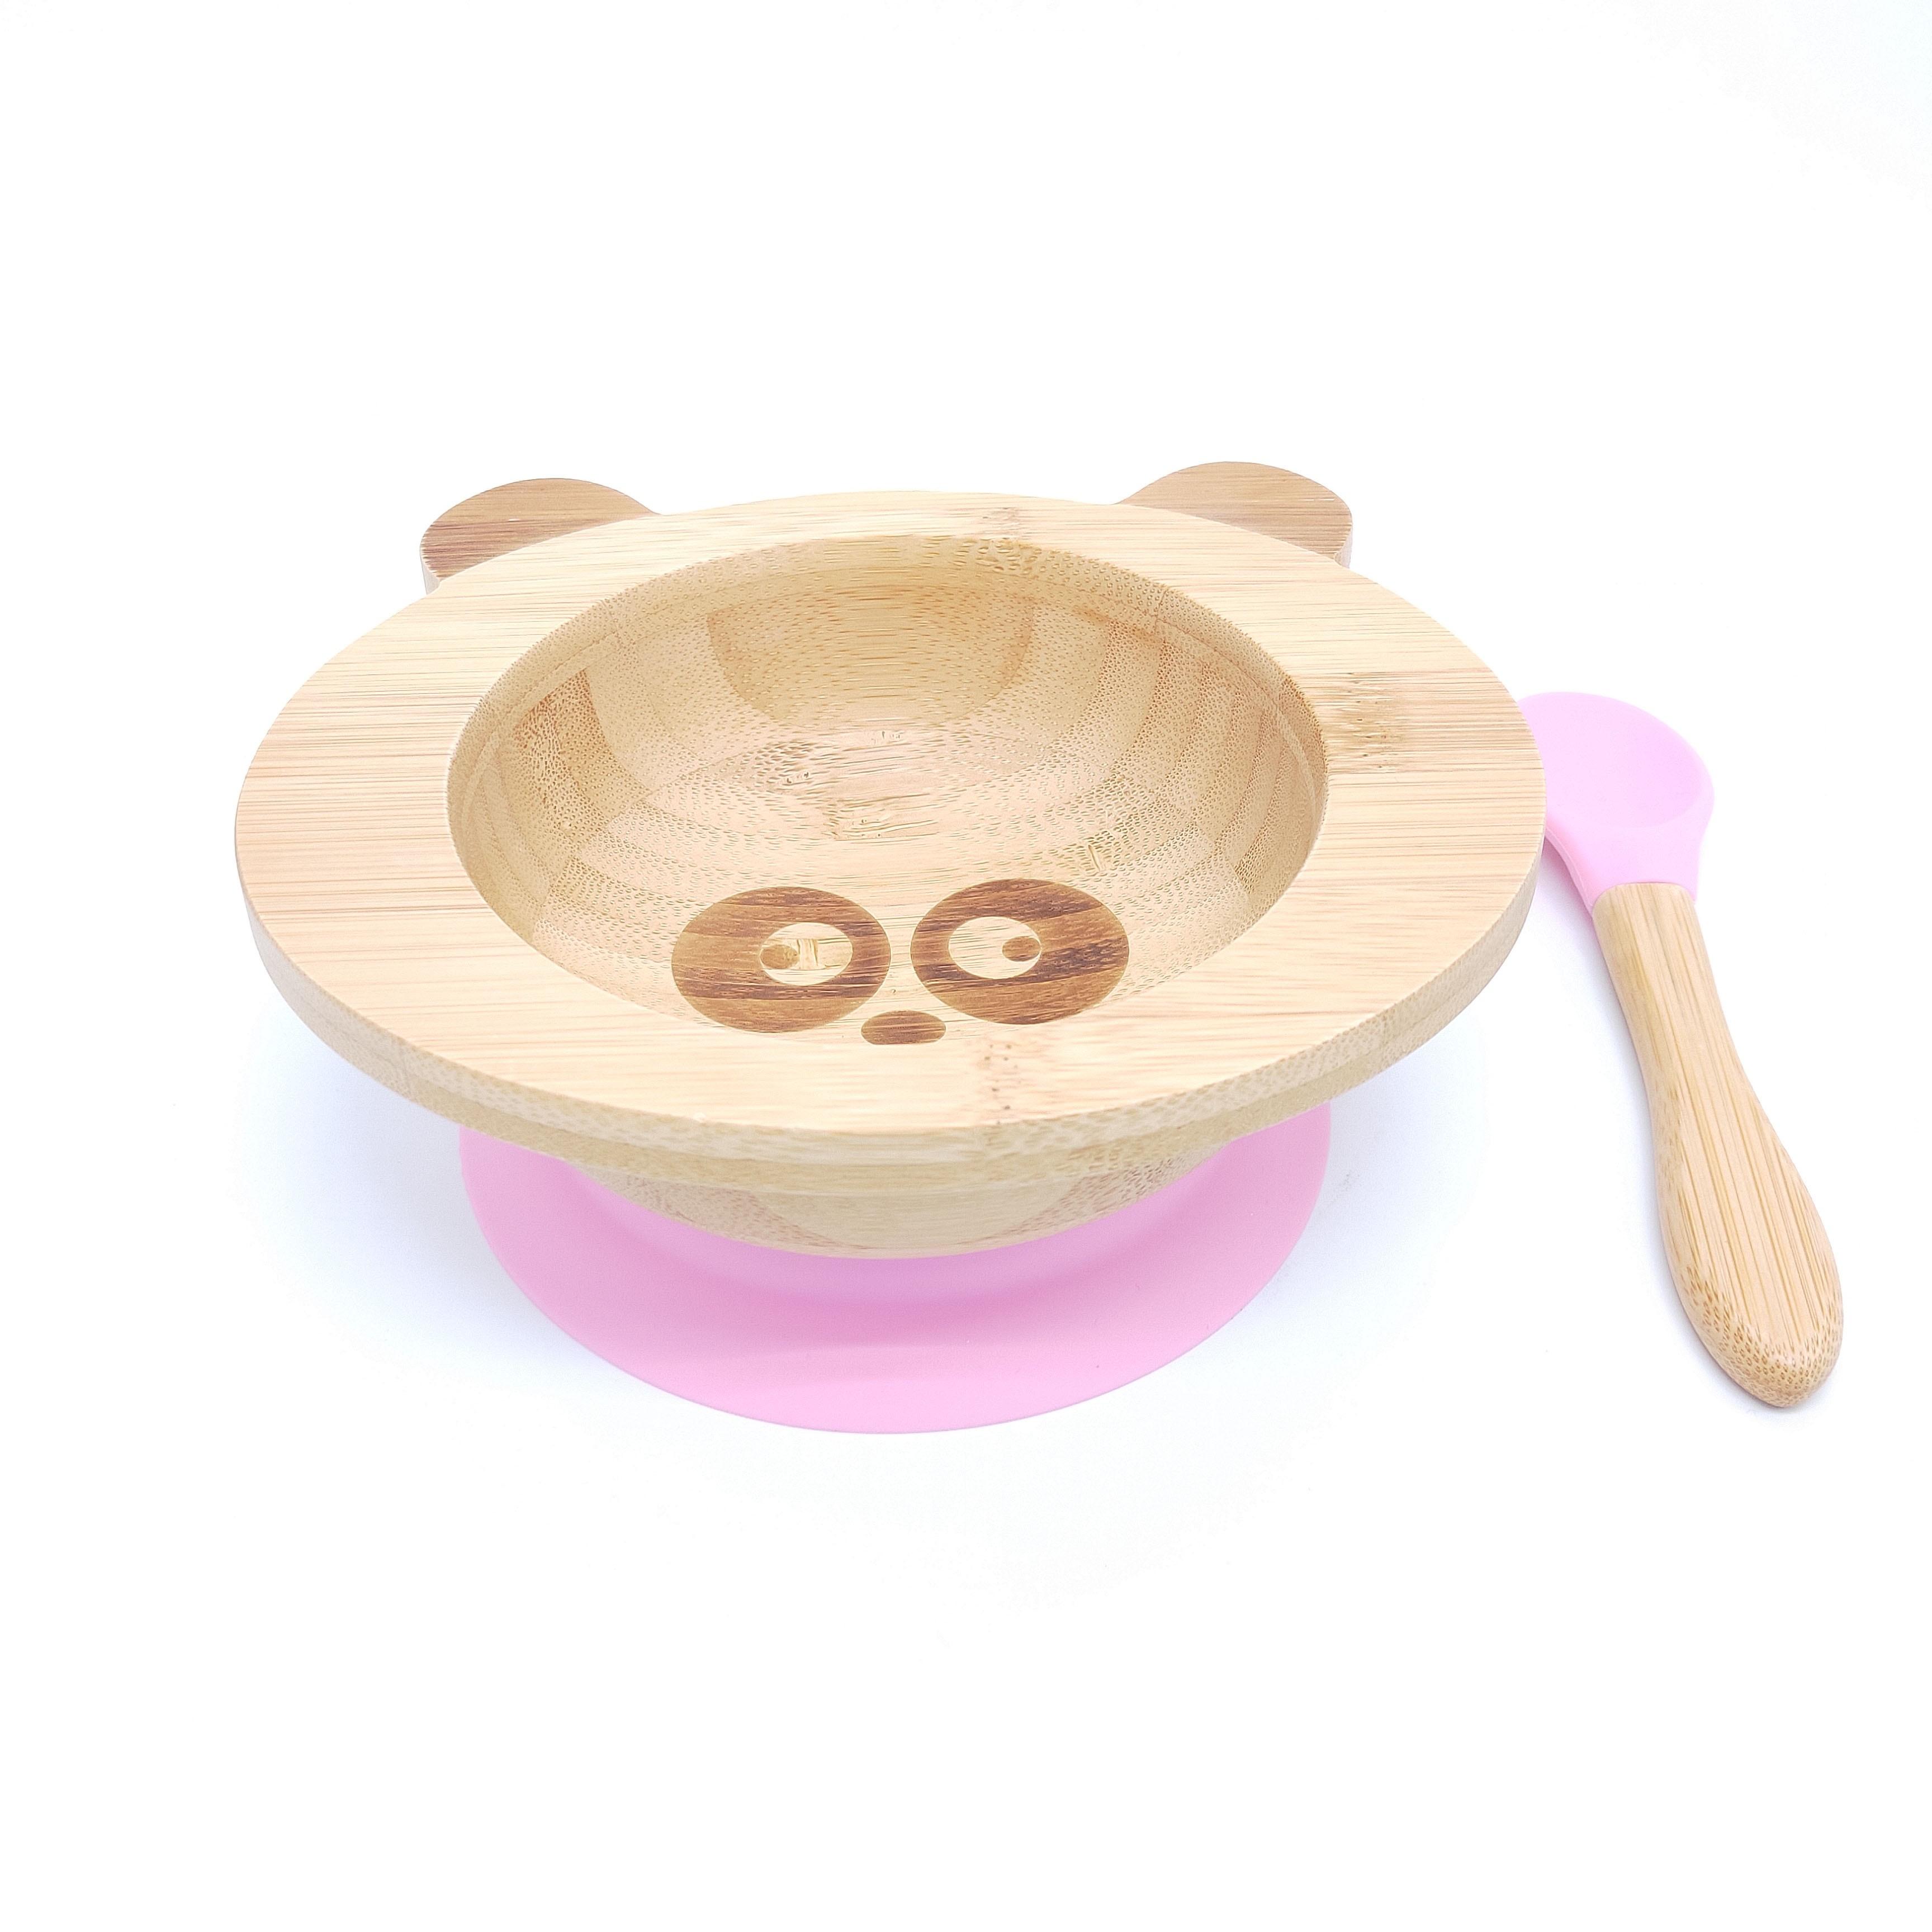 Kinderschüssel mitSilikonboden Bambus / Rosa